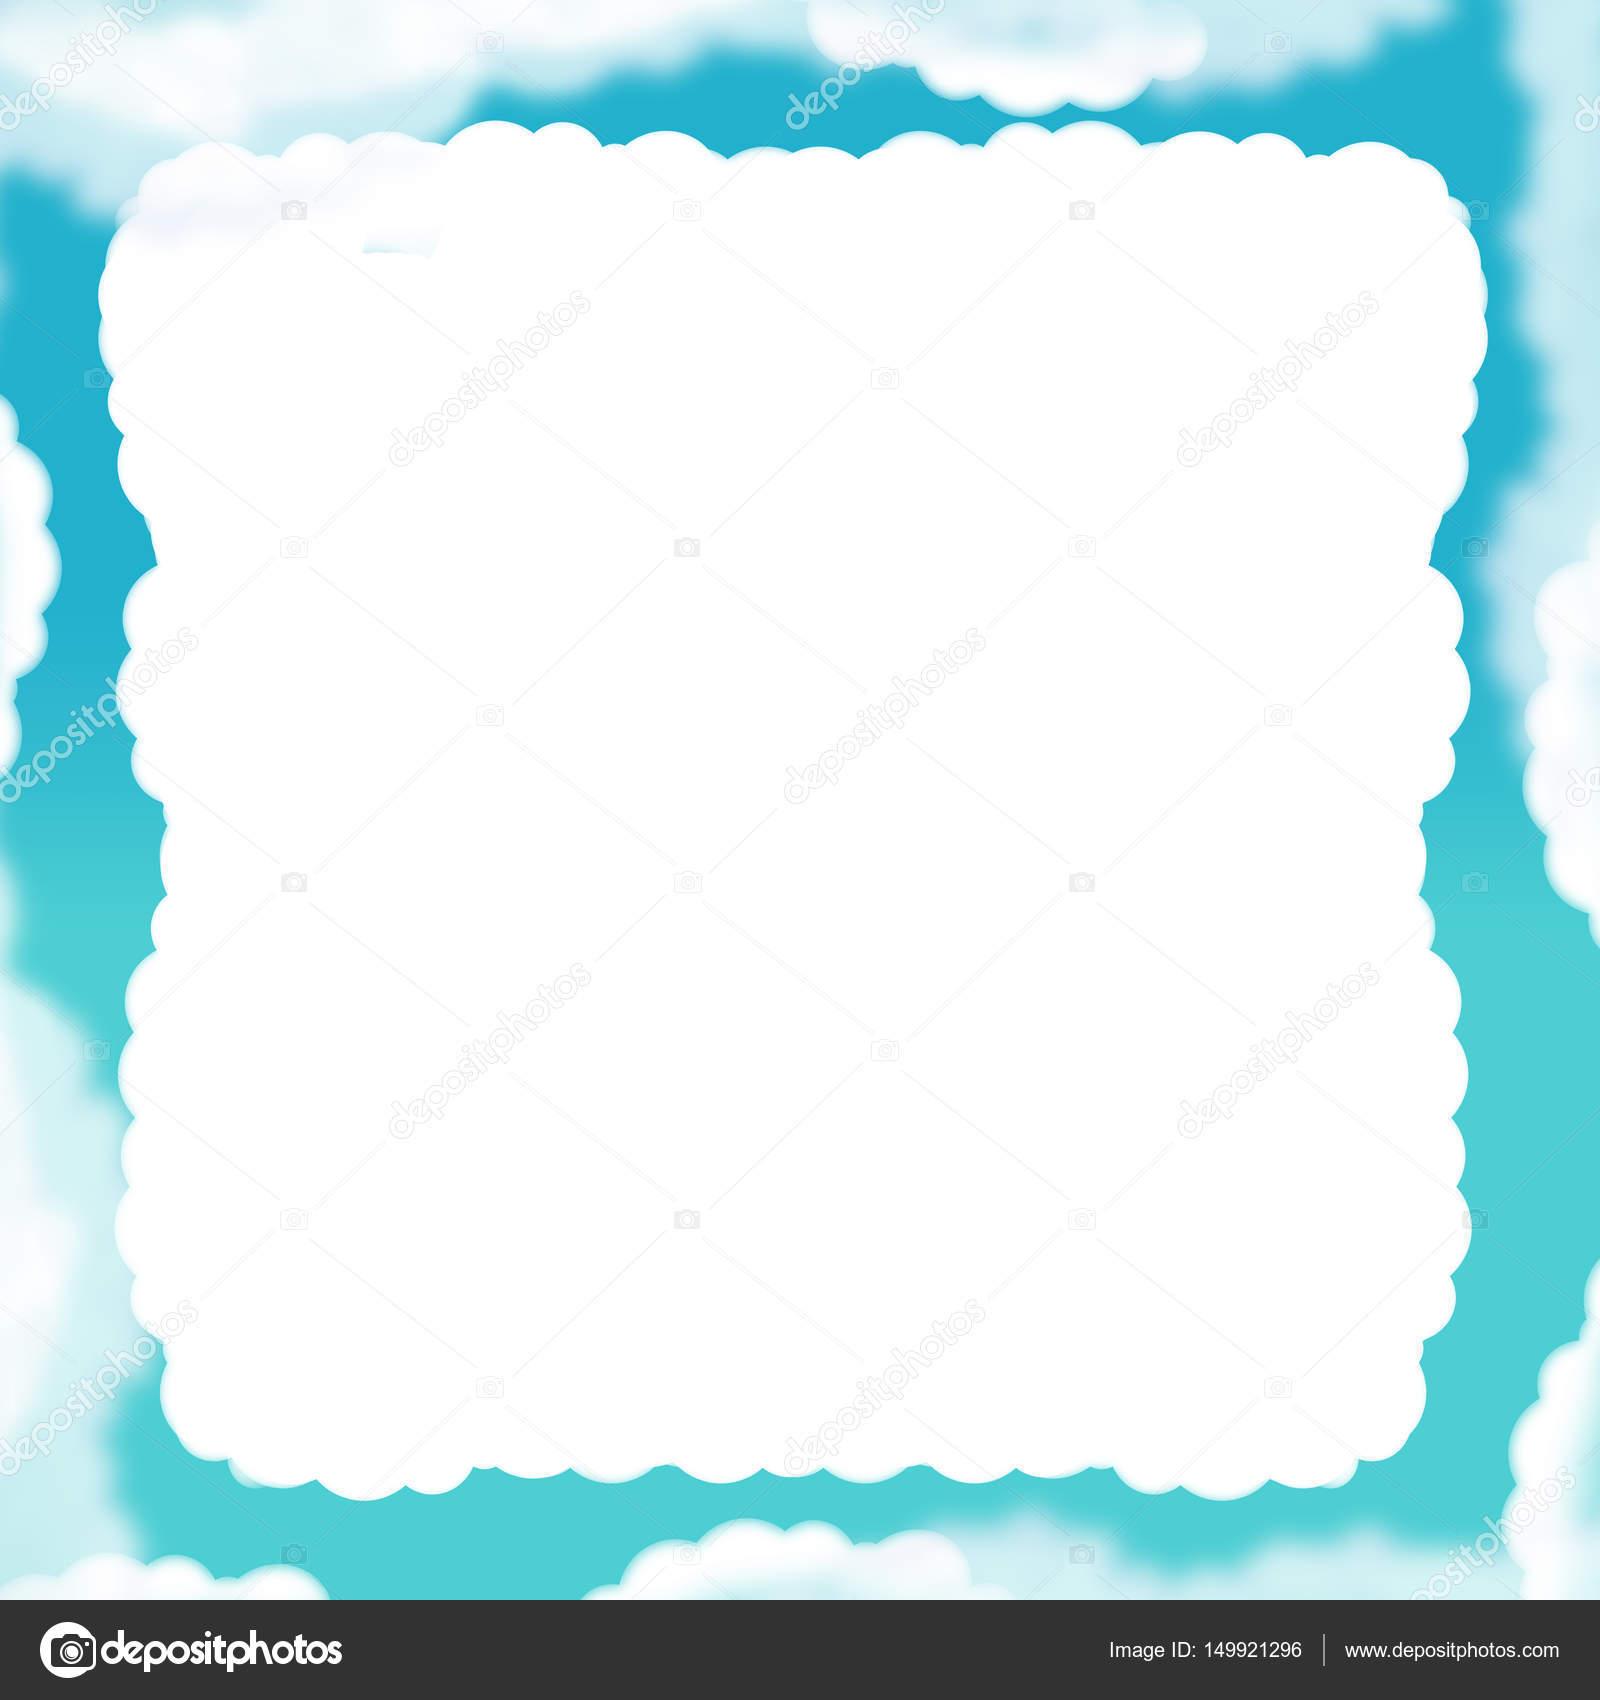 cartoon cloud frame — Stock Photo © agaes8080 #149921296